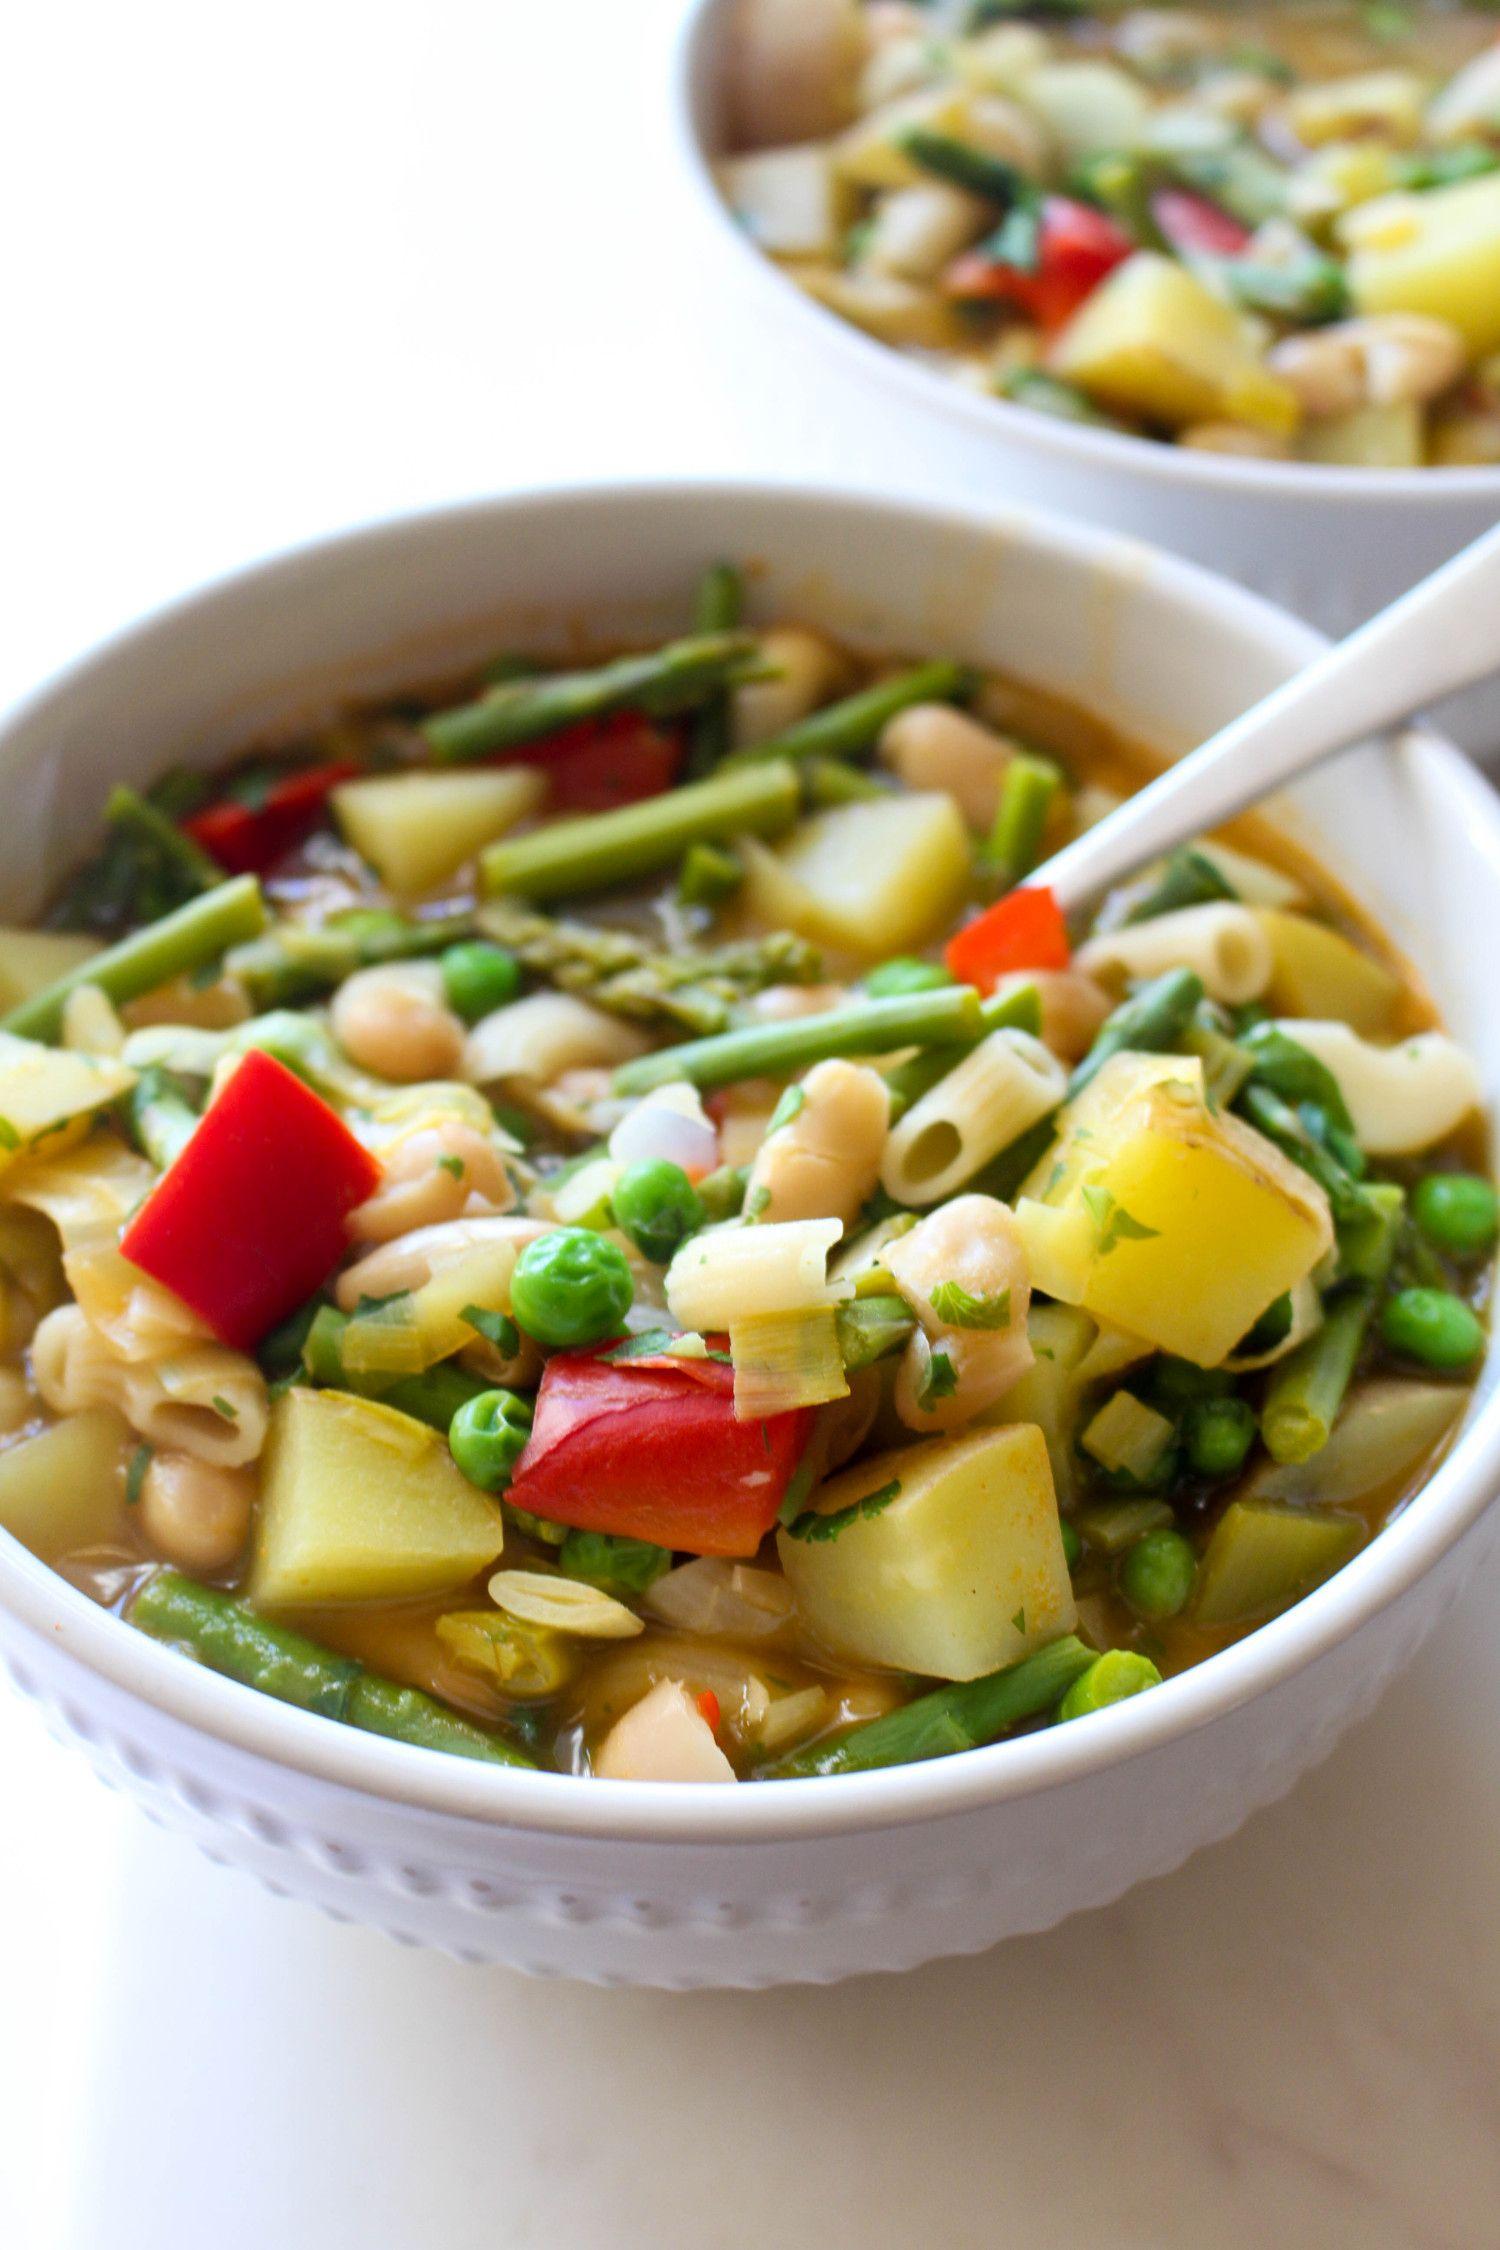 Spring minestrone recipe ready